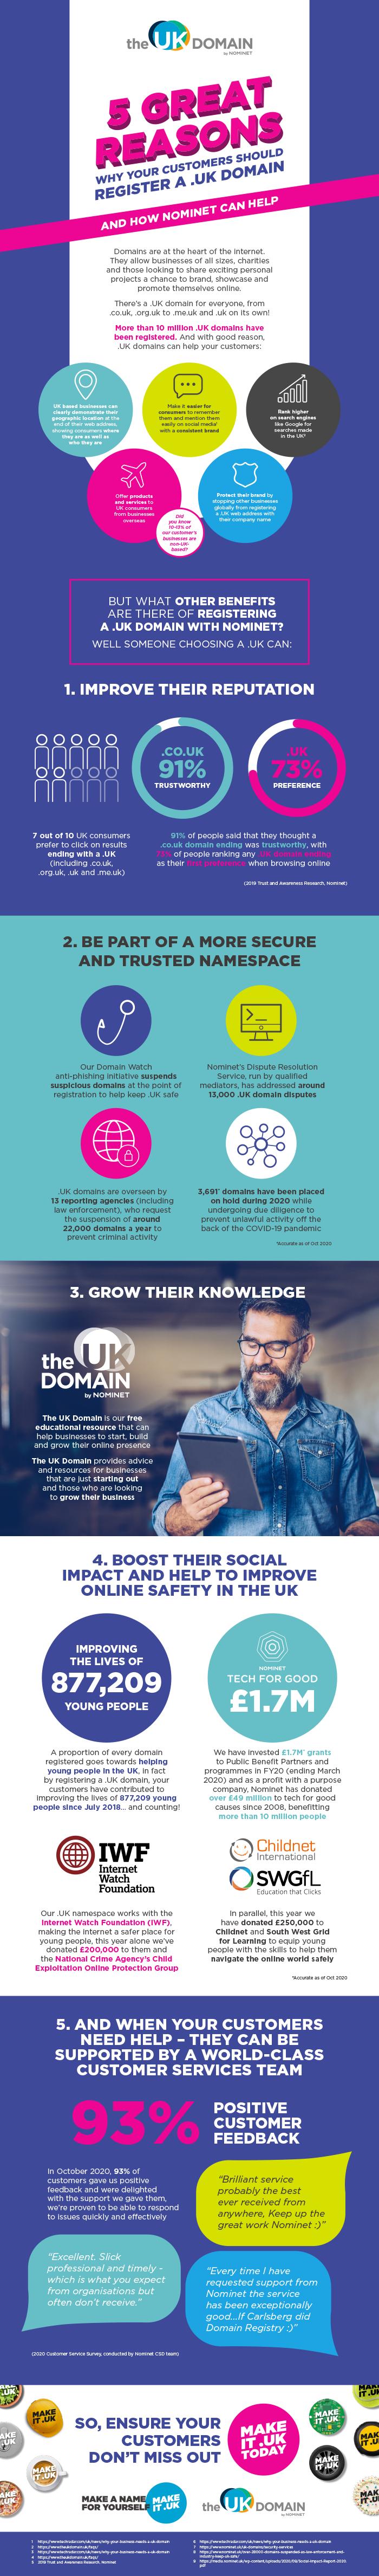 UK Domain Registrars Infographic